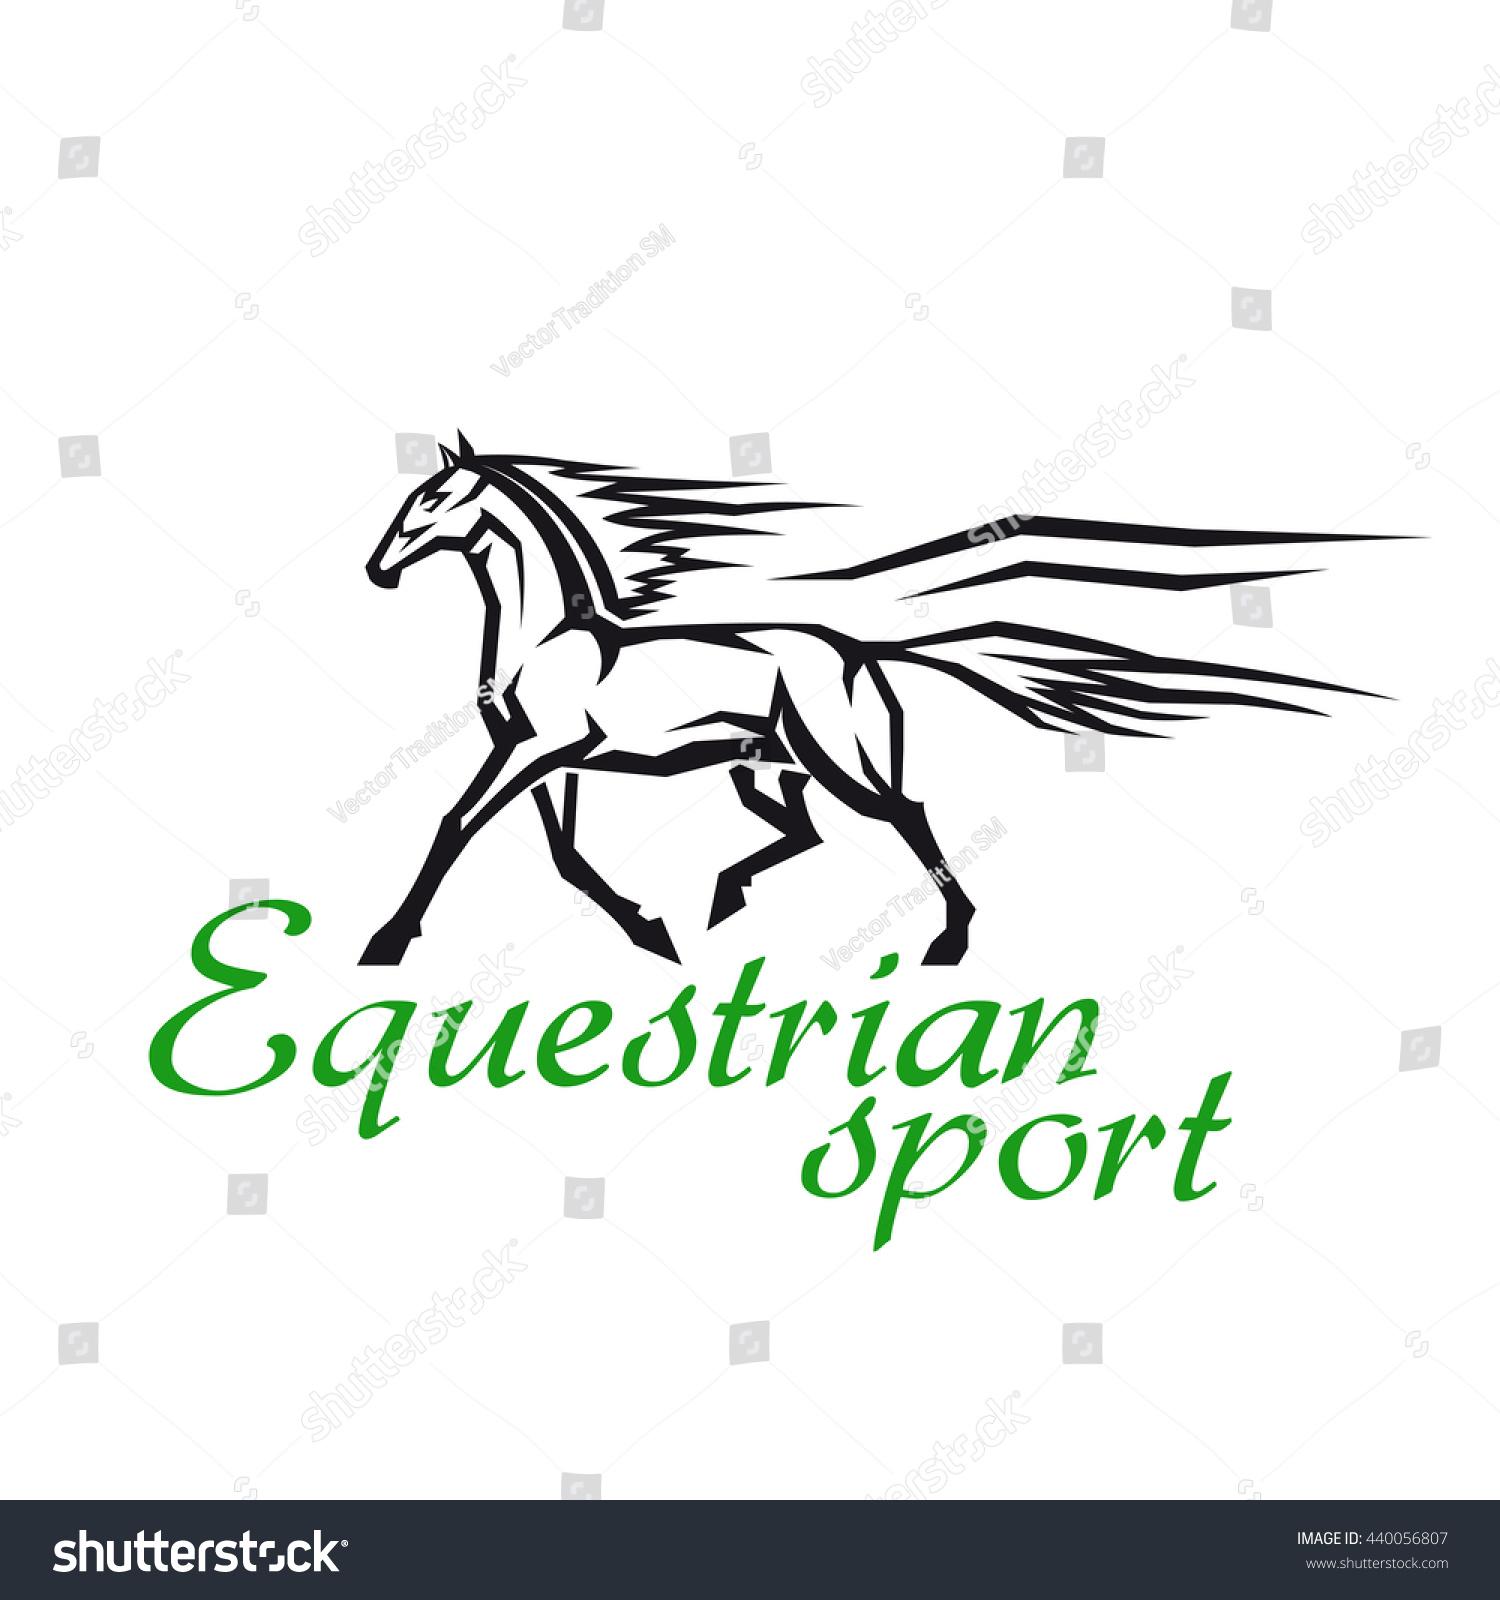 Horse racing gambling symbol equestrian sport stock vector horse racing and gambling symbol for equestrian sport design with galloping horse of a thoroughbred breed buycottarizona